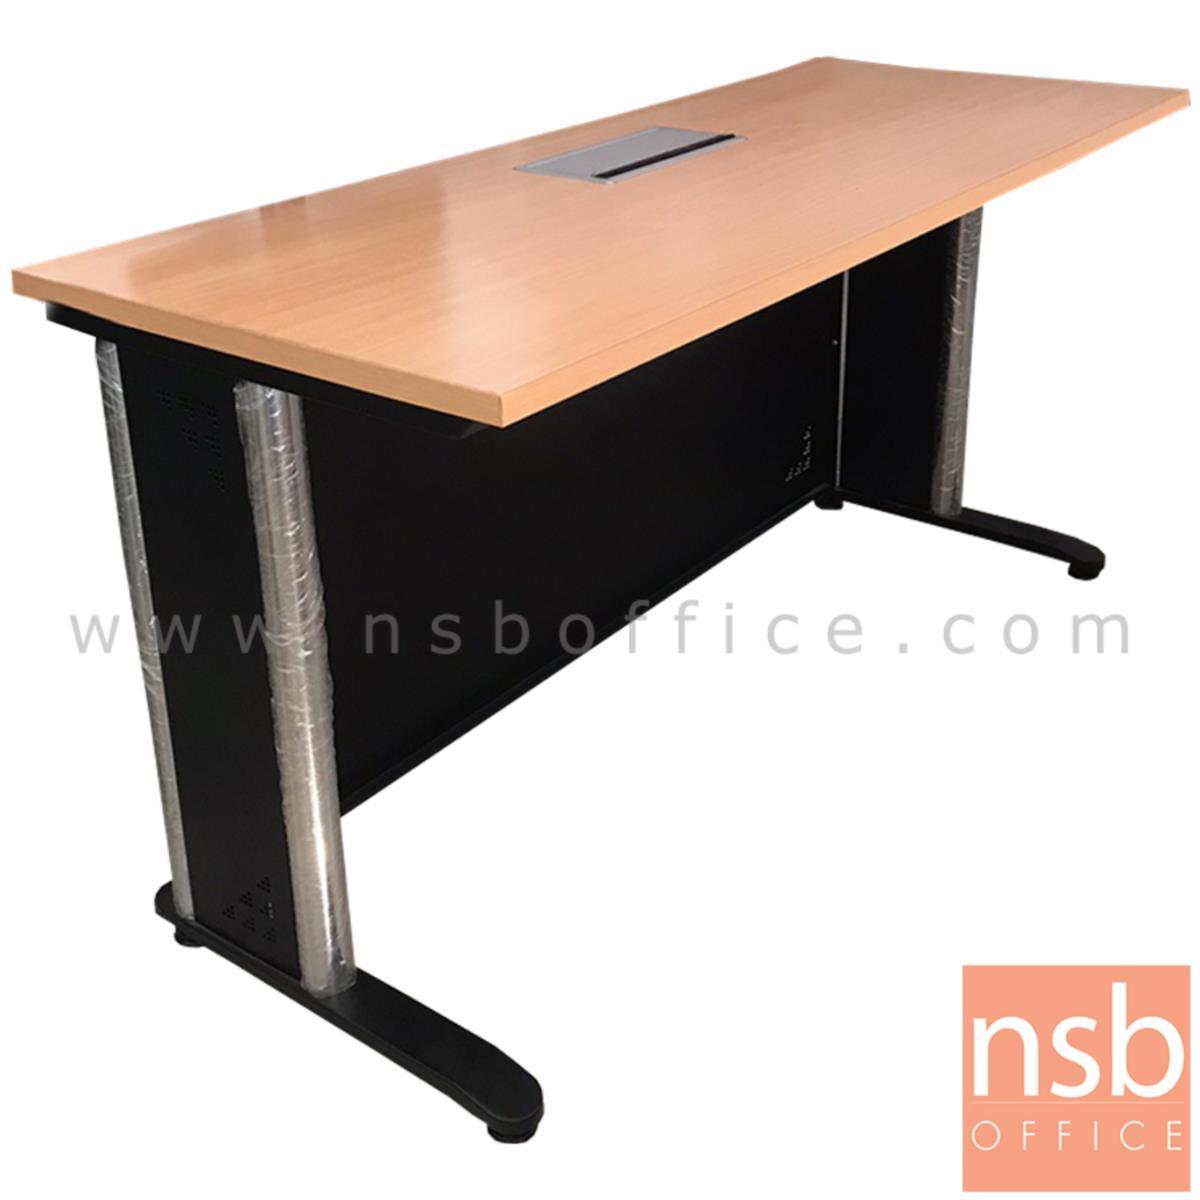 L10A200:โต๊ะทำงานโล่ง+POP UP  ขนาด 150W*76H cm.  ขาเหล็กพ่นดำ